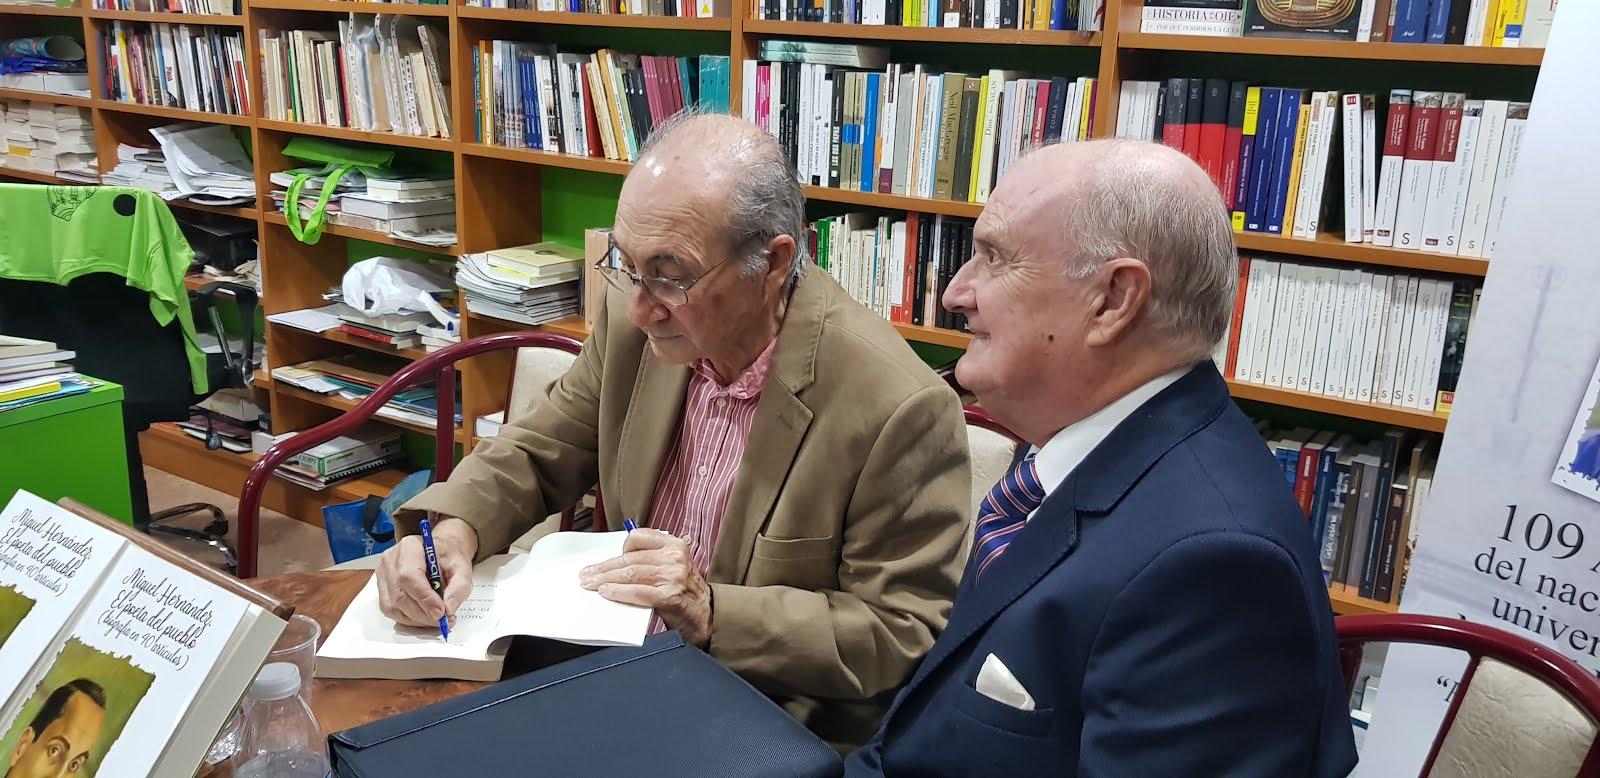 Firmado libros en Orihuela